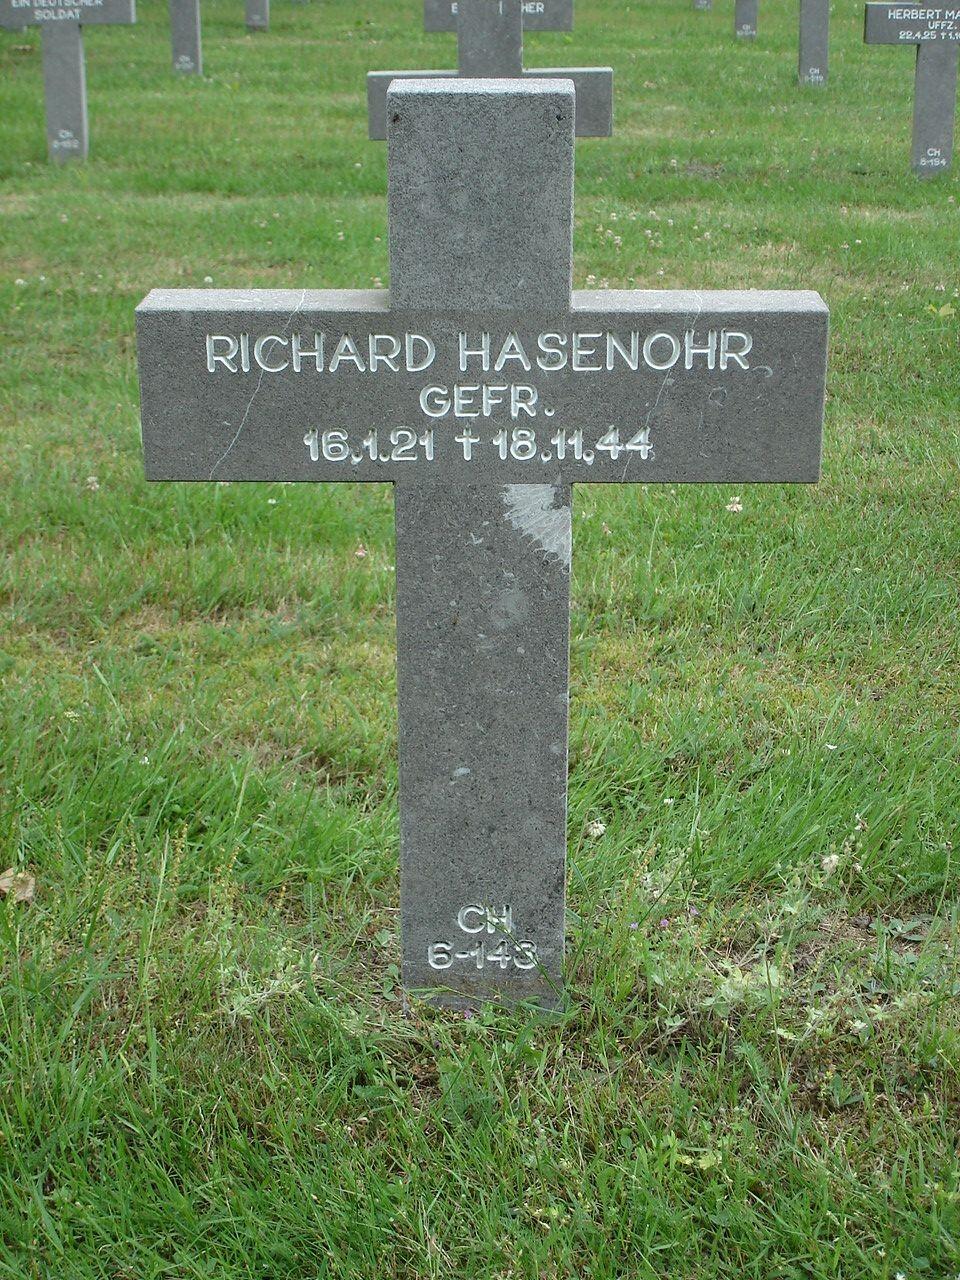 Richard Hasenohr